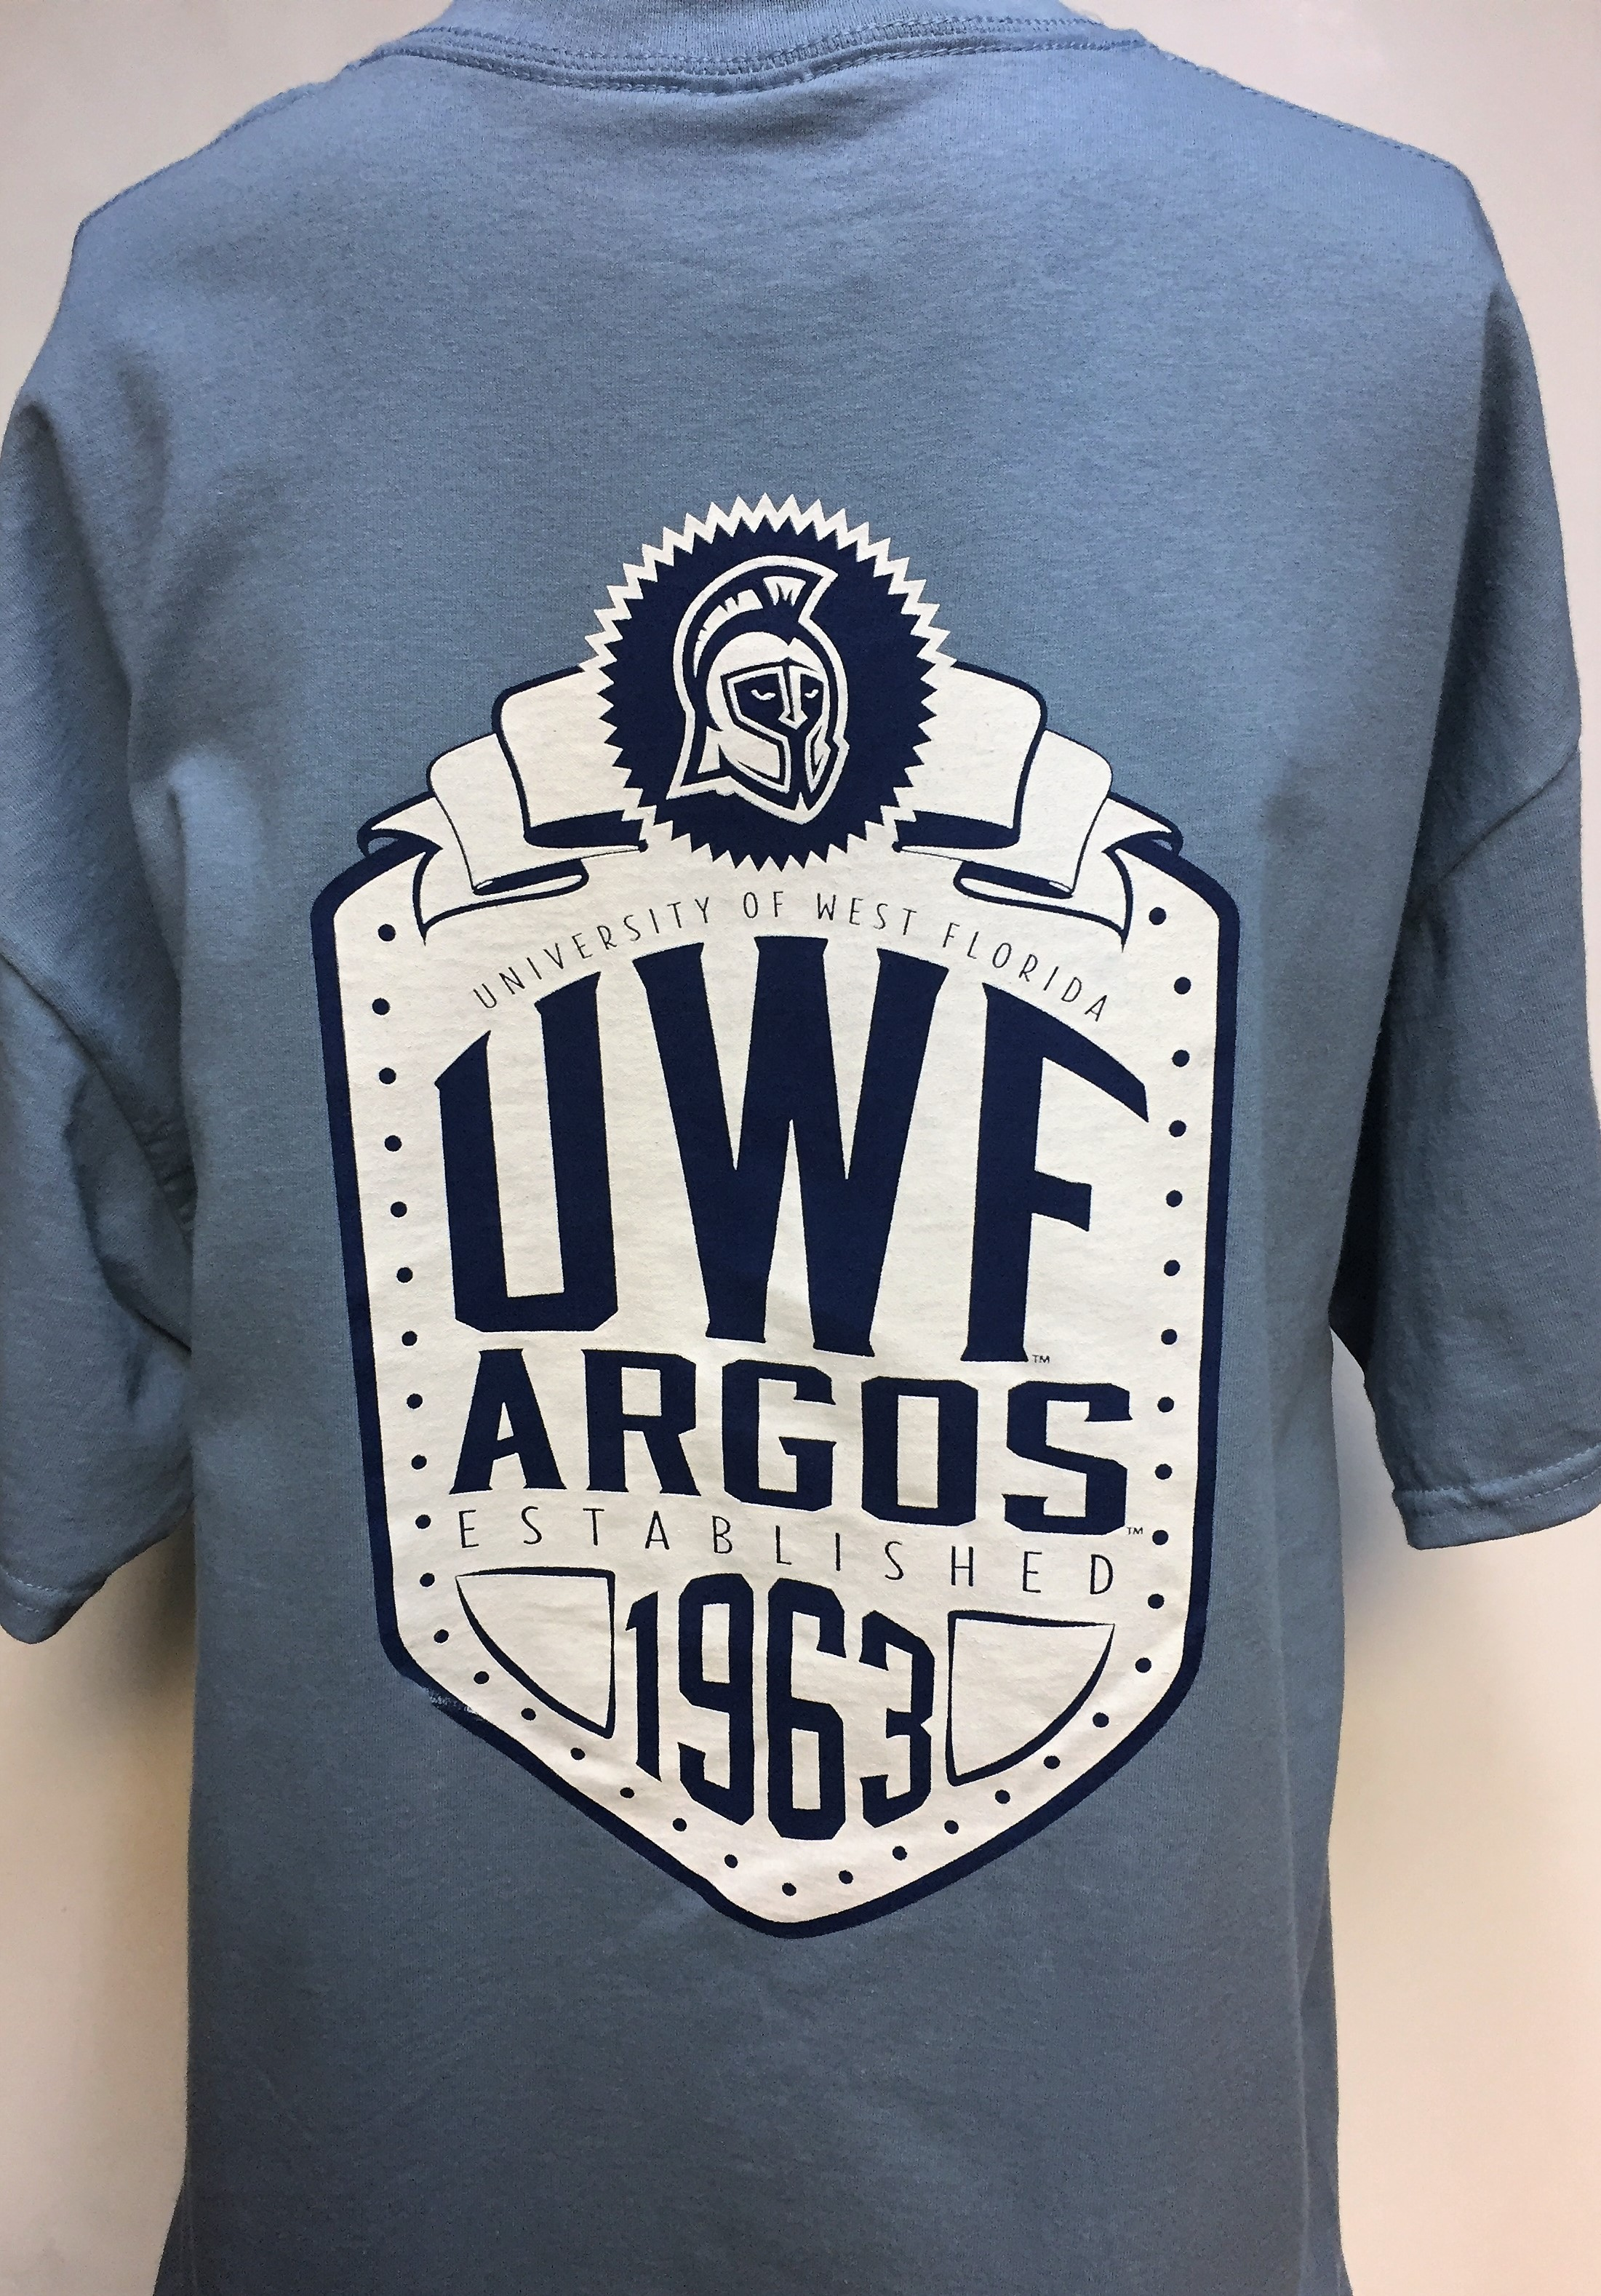 UWF ARGOS ESTABLISHED